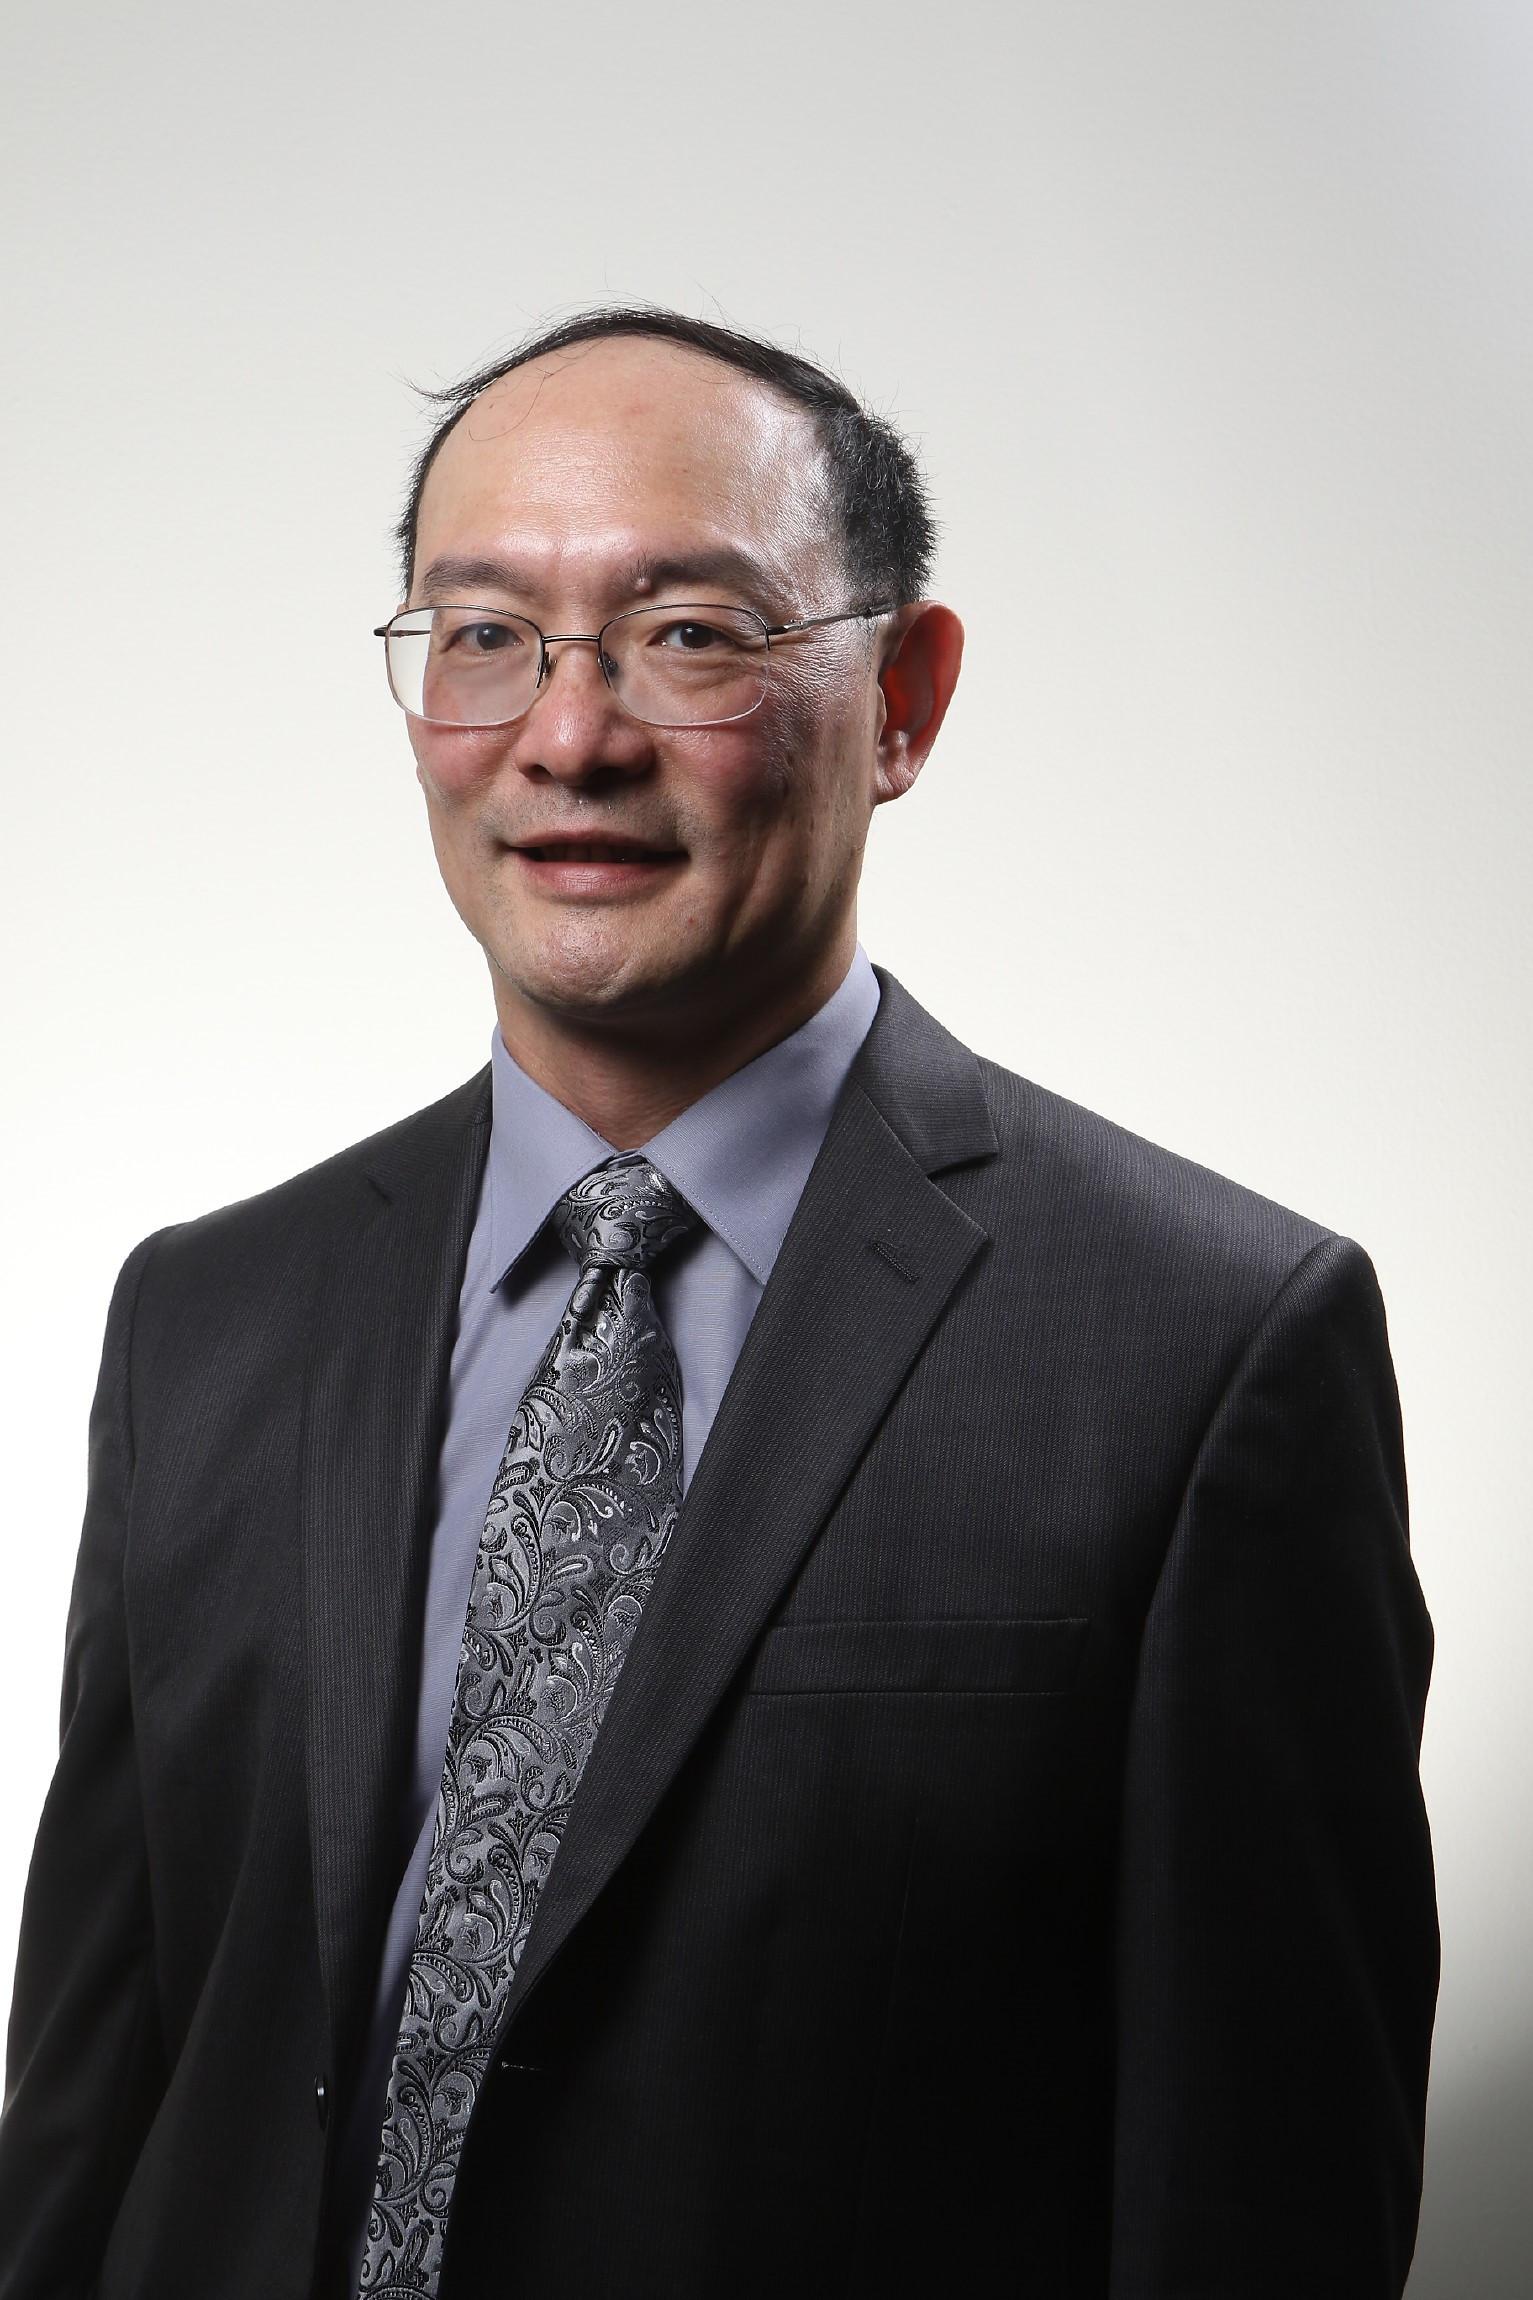 Hsinlin Thomas Cheng, MD, PhD's avatar